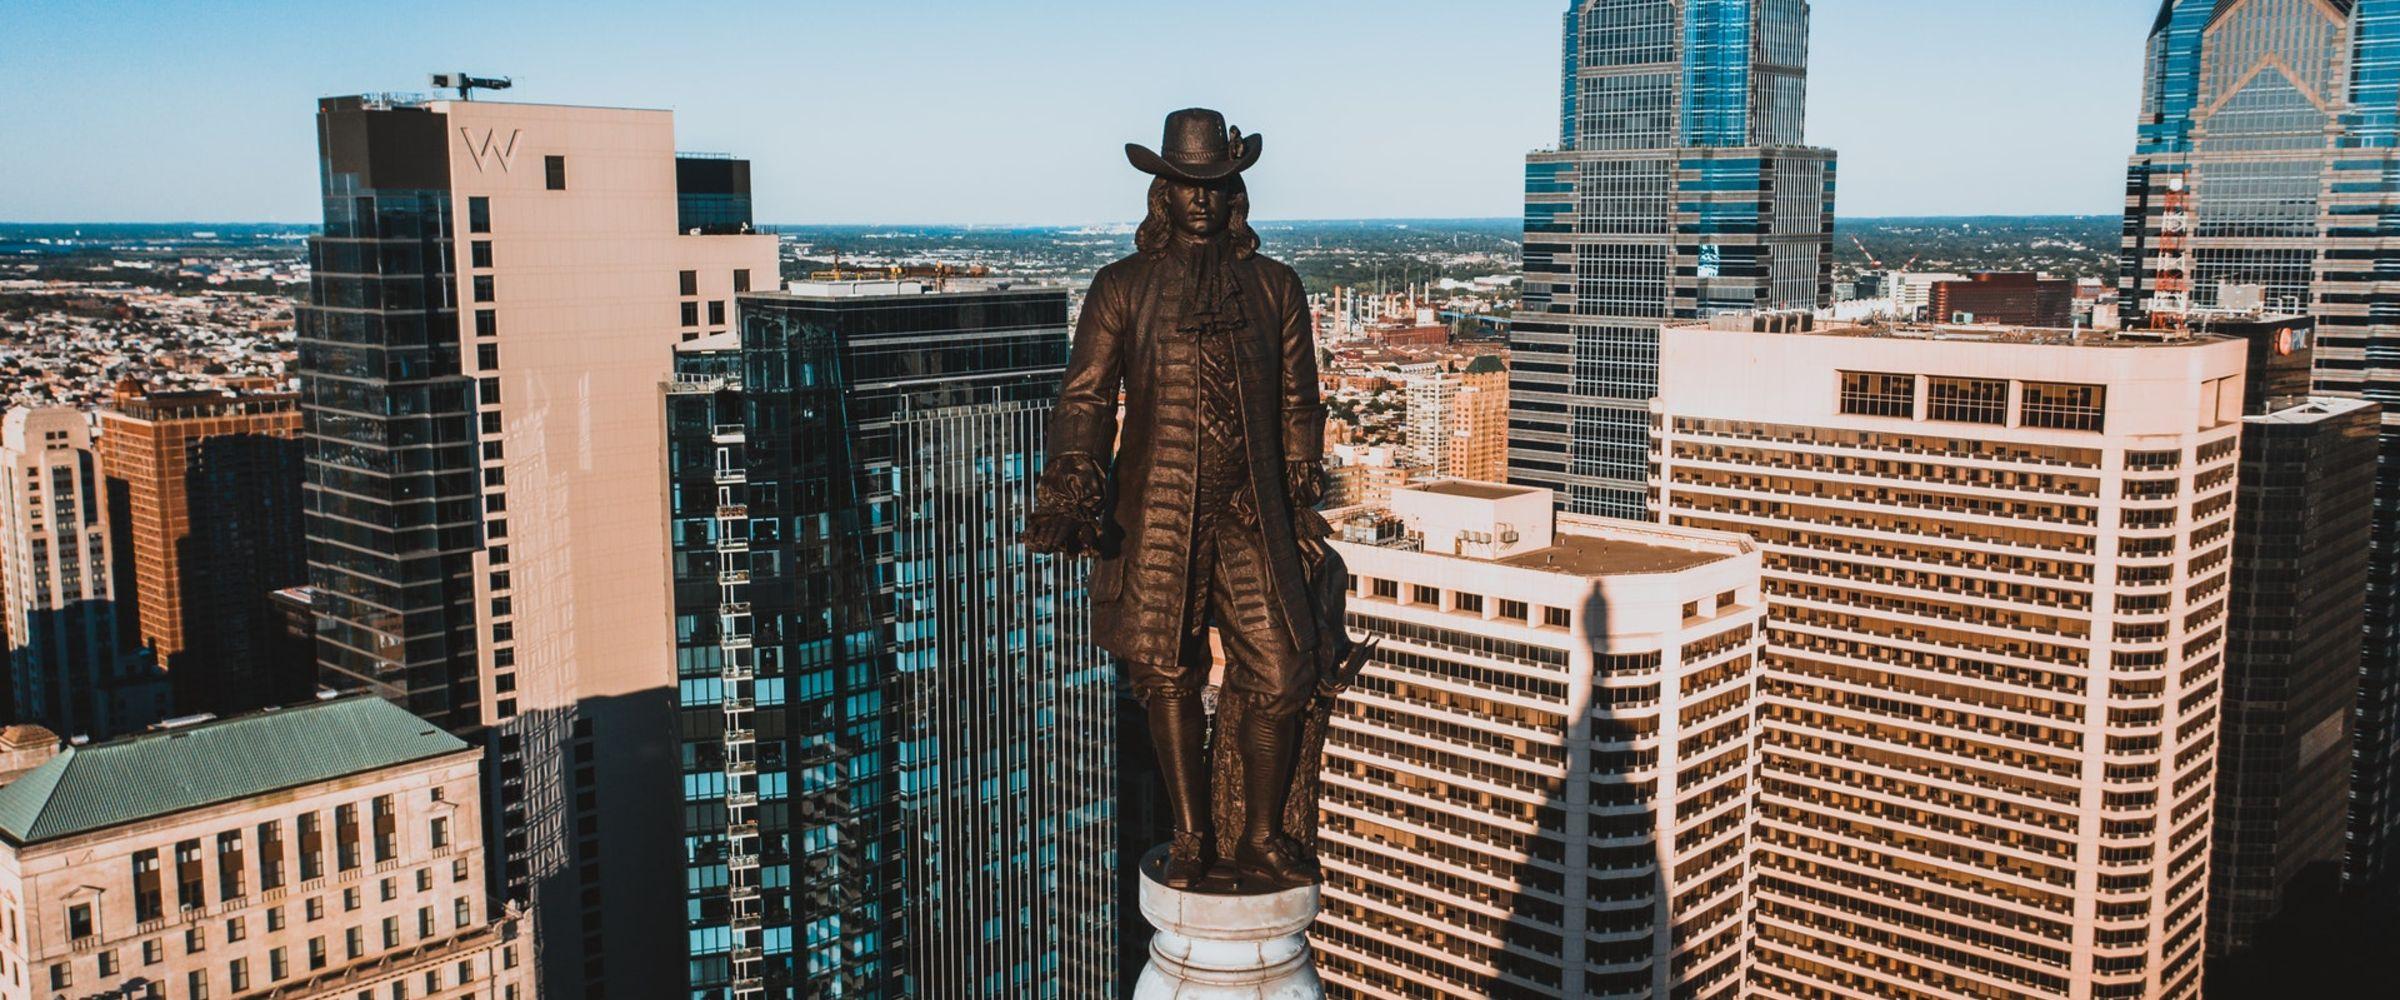 Philadelphia cost of living city view